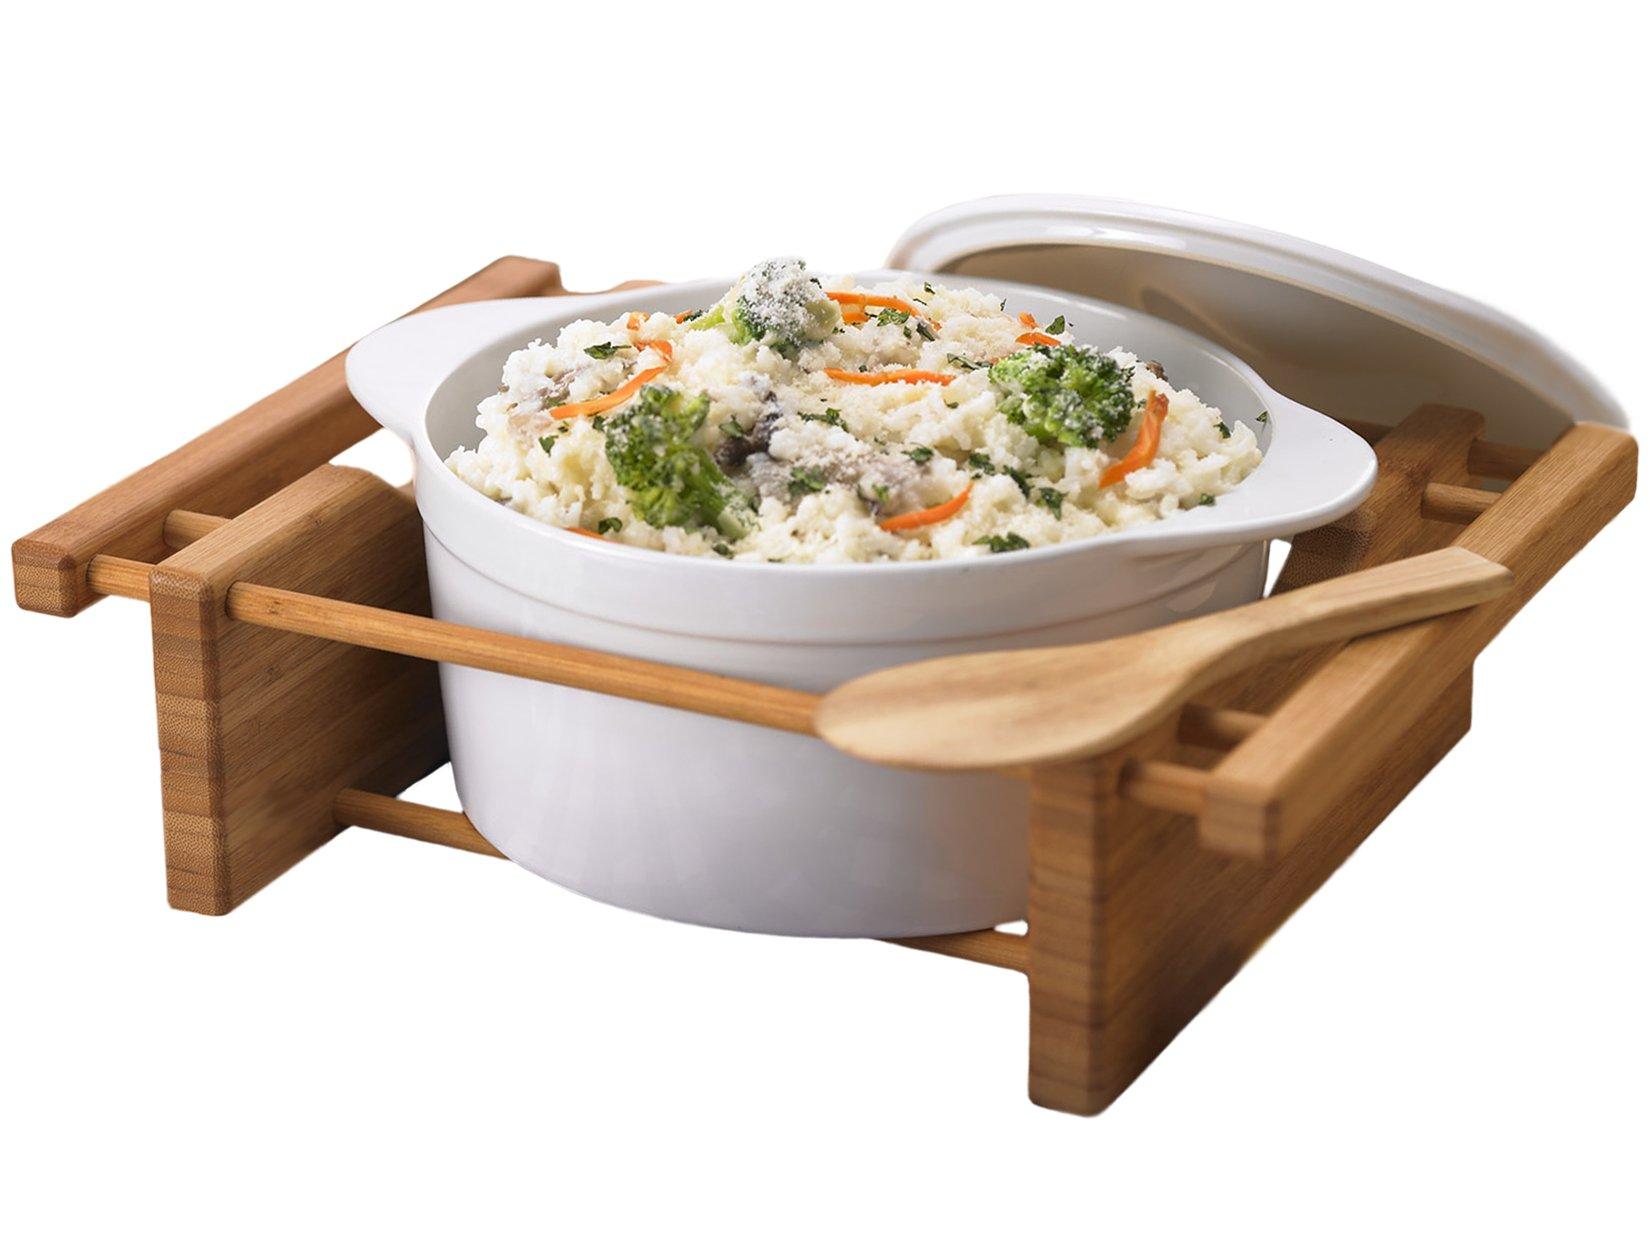 Creative Home 73459 2.5-Quart Grand Buffet Covered Casserole